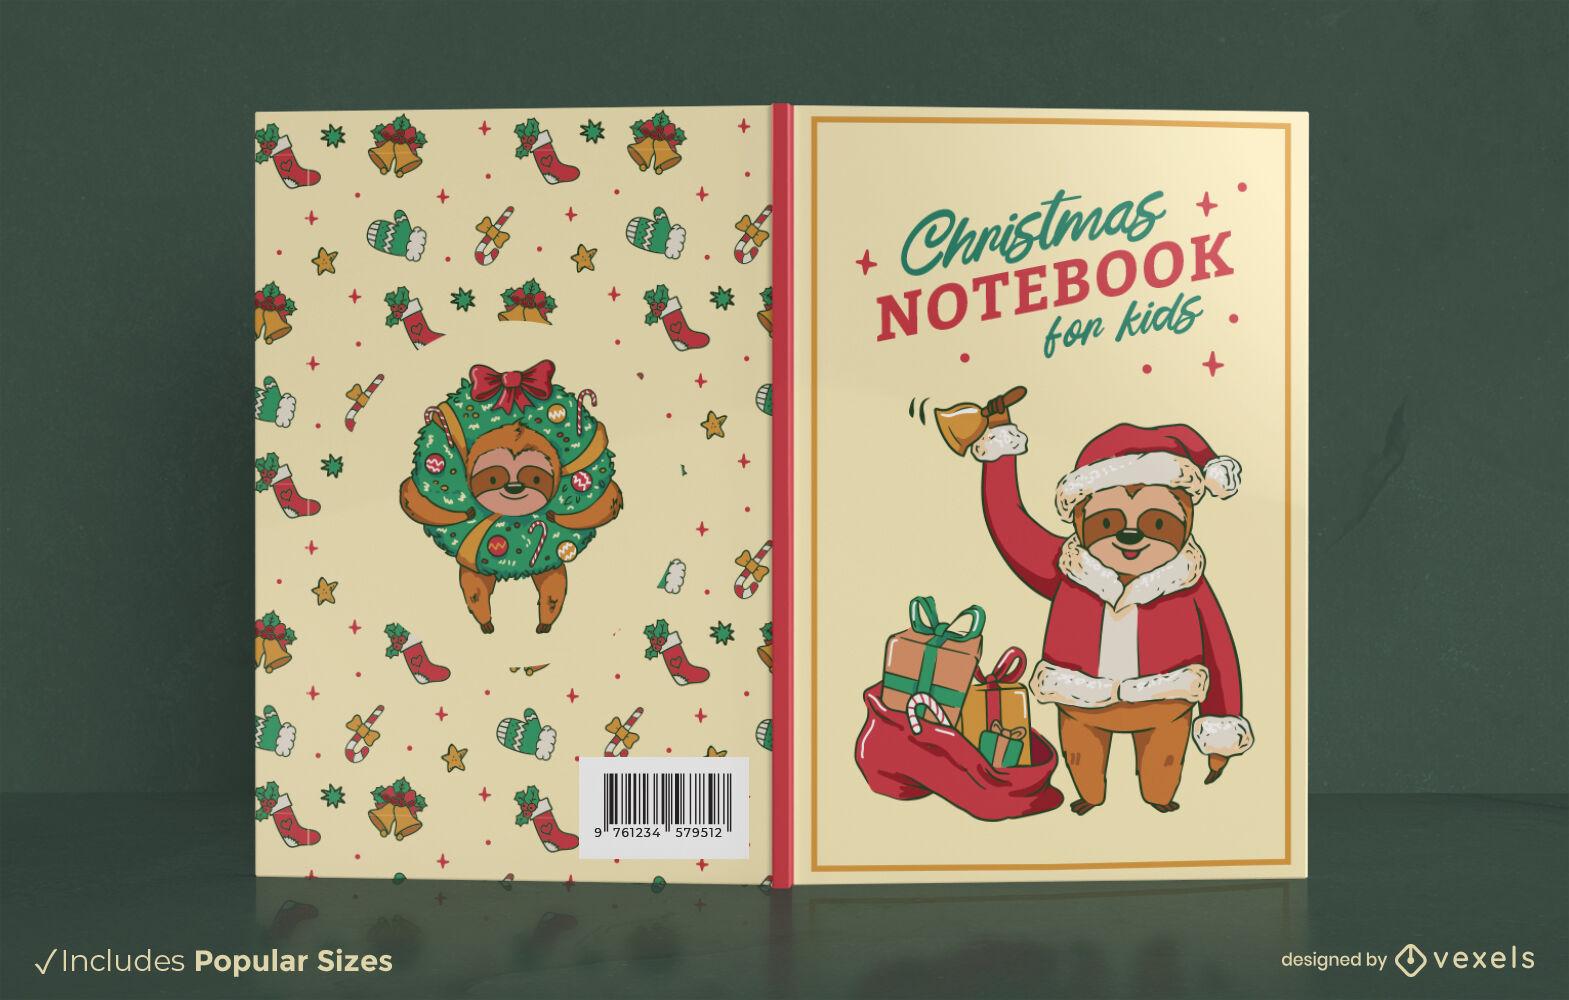 Beautiful Christmas sloth book cover design